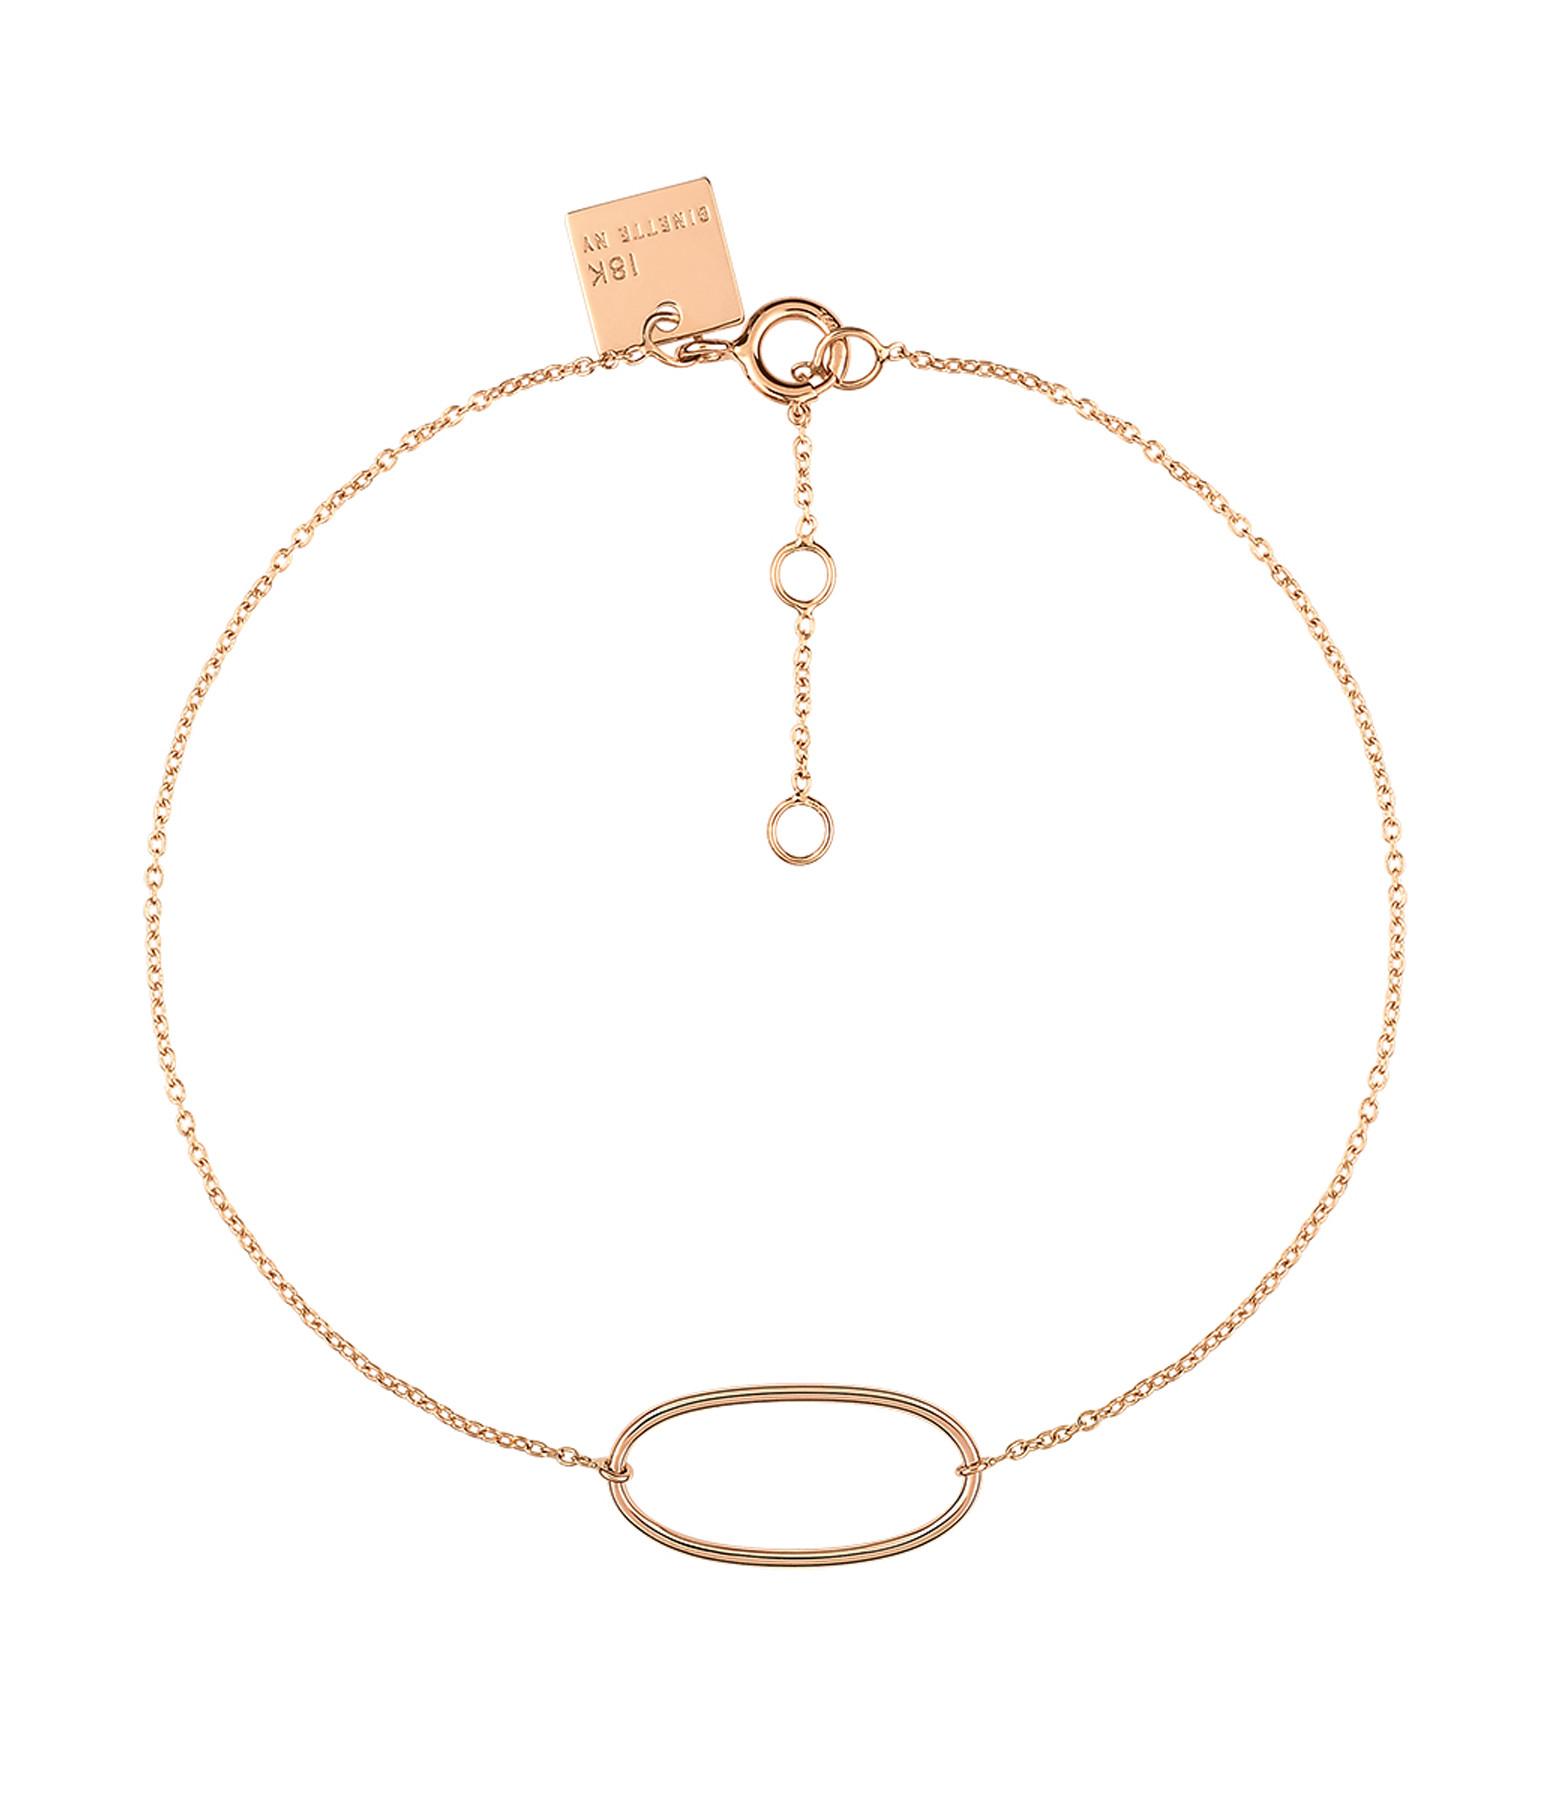 GINETTE_NY - Bracelet Ellipses Or Rose